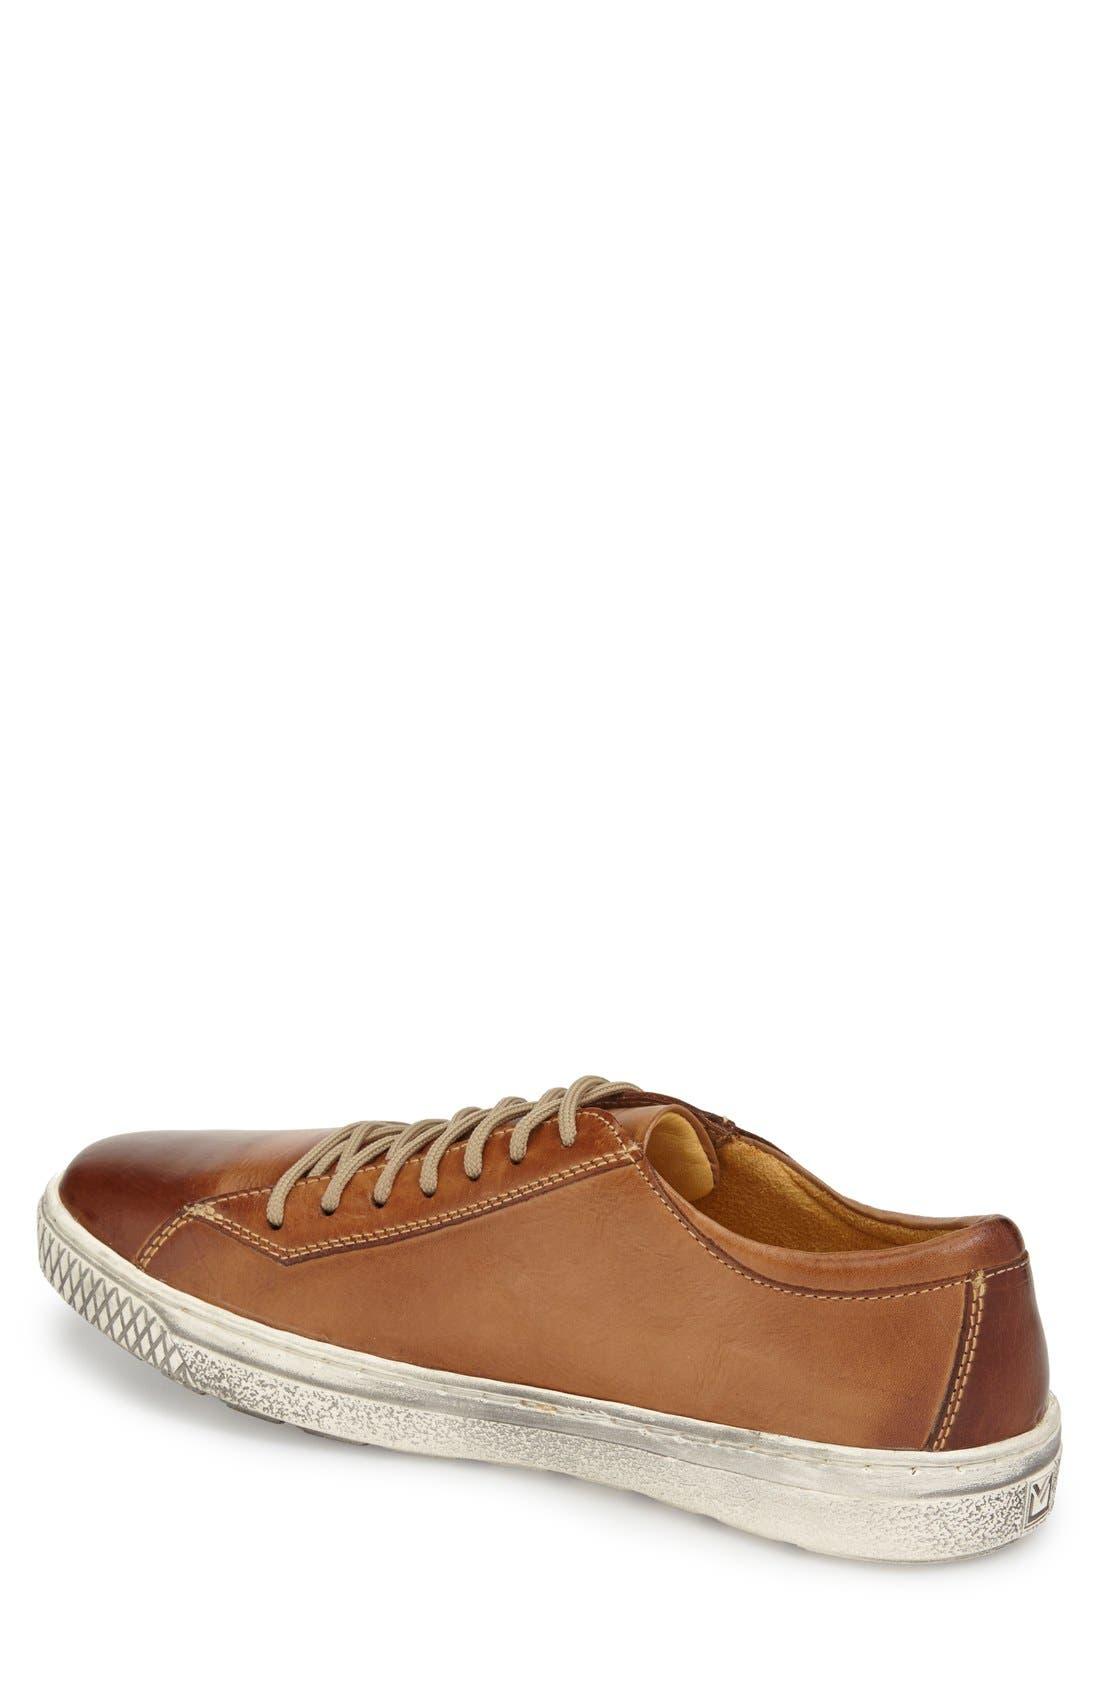 'Rolly' Sneaker,                             Alternate thumbnail 2, color,                             Tan